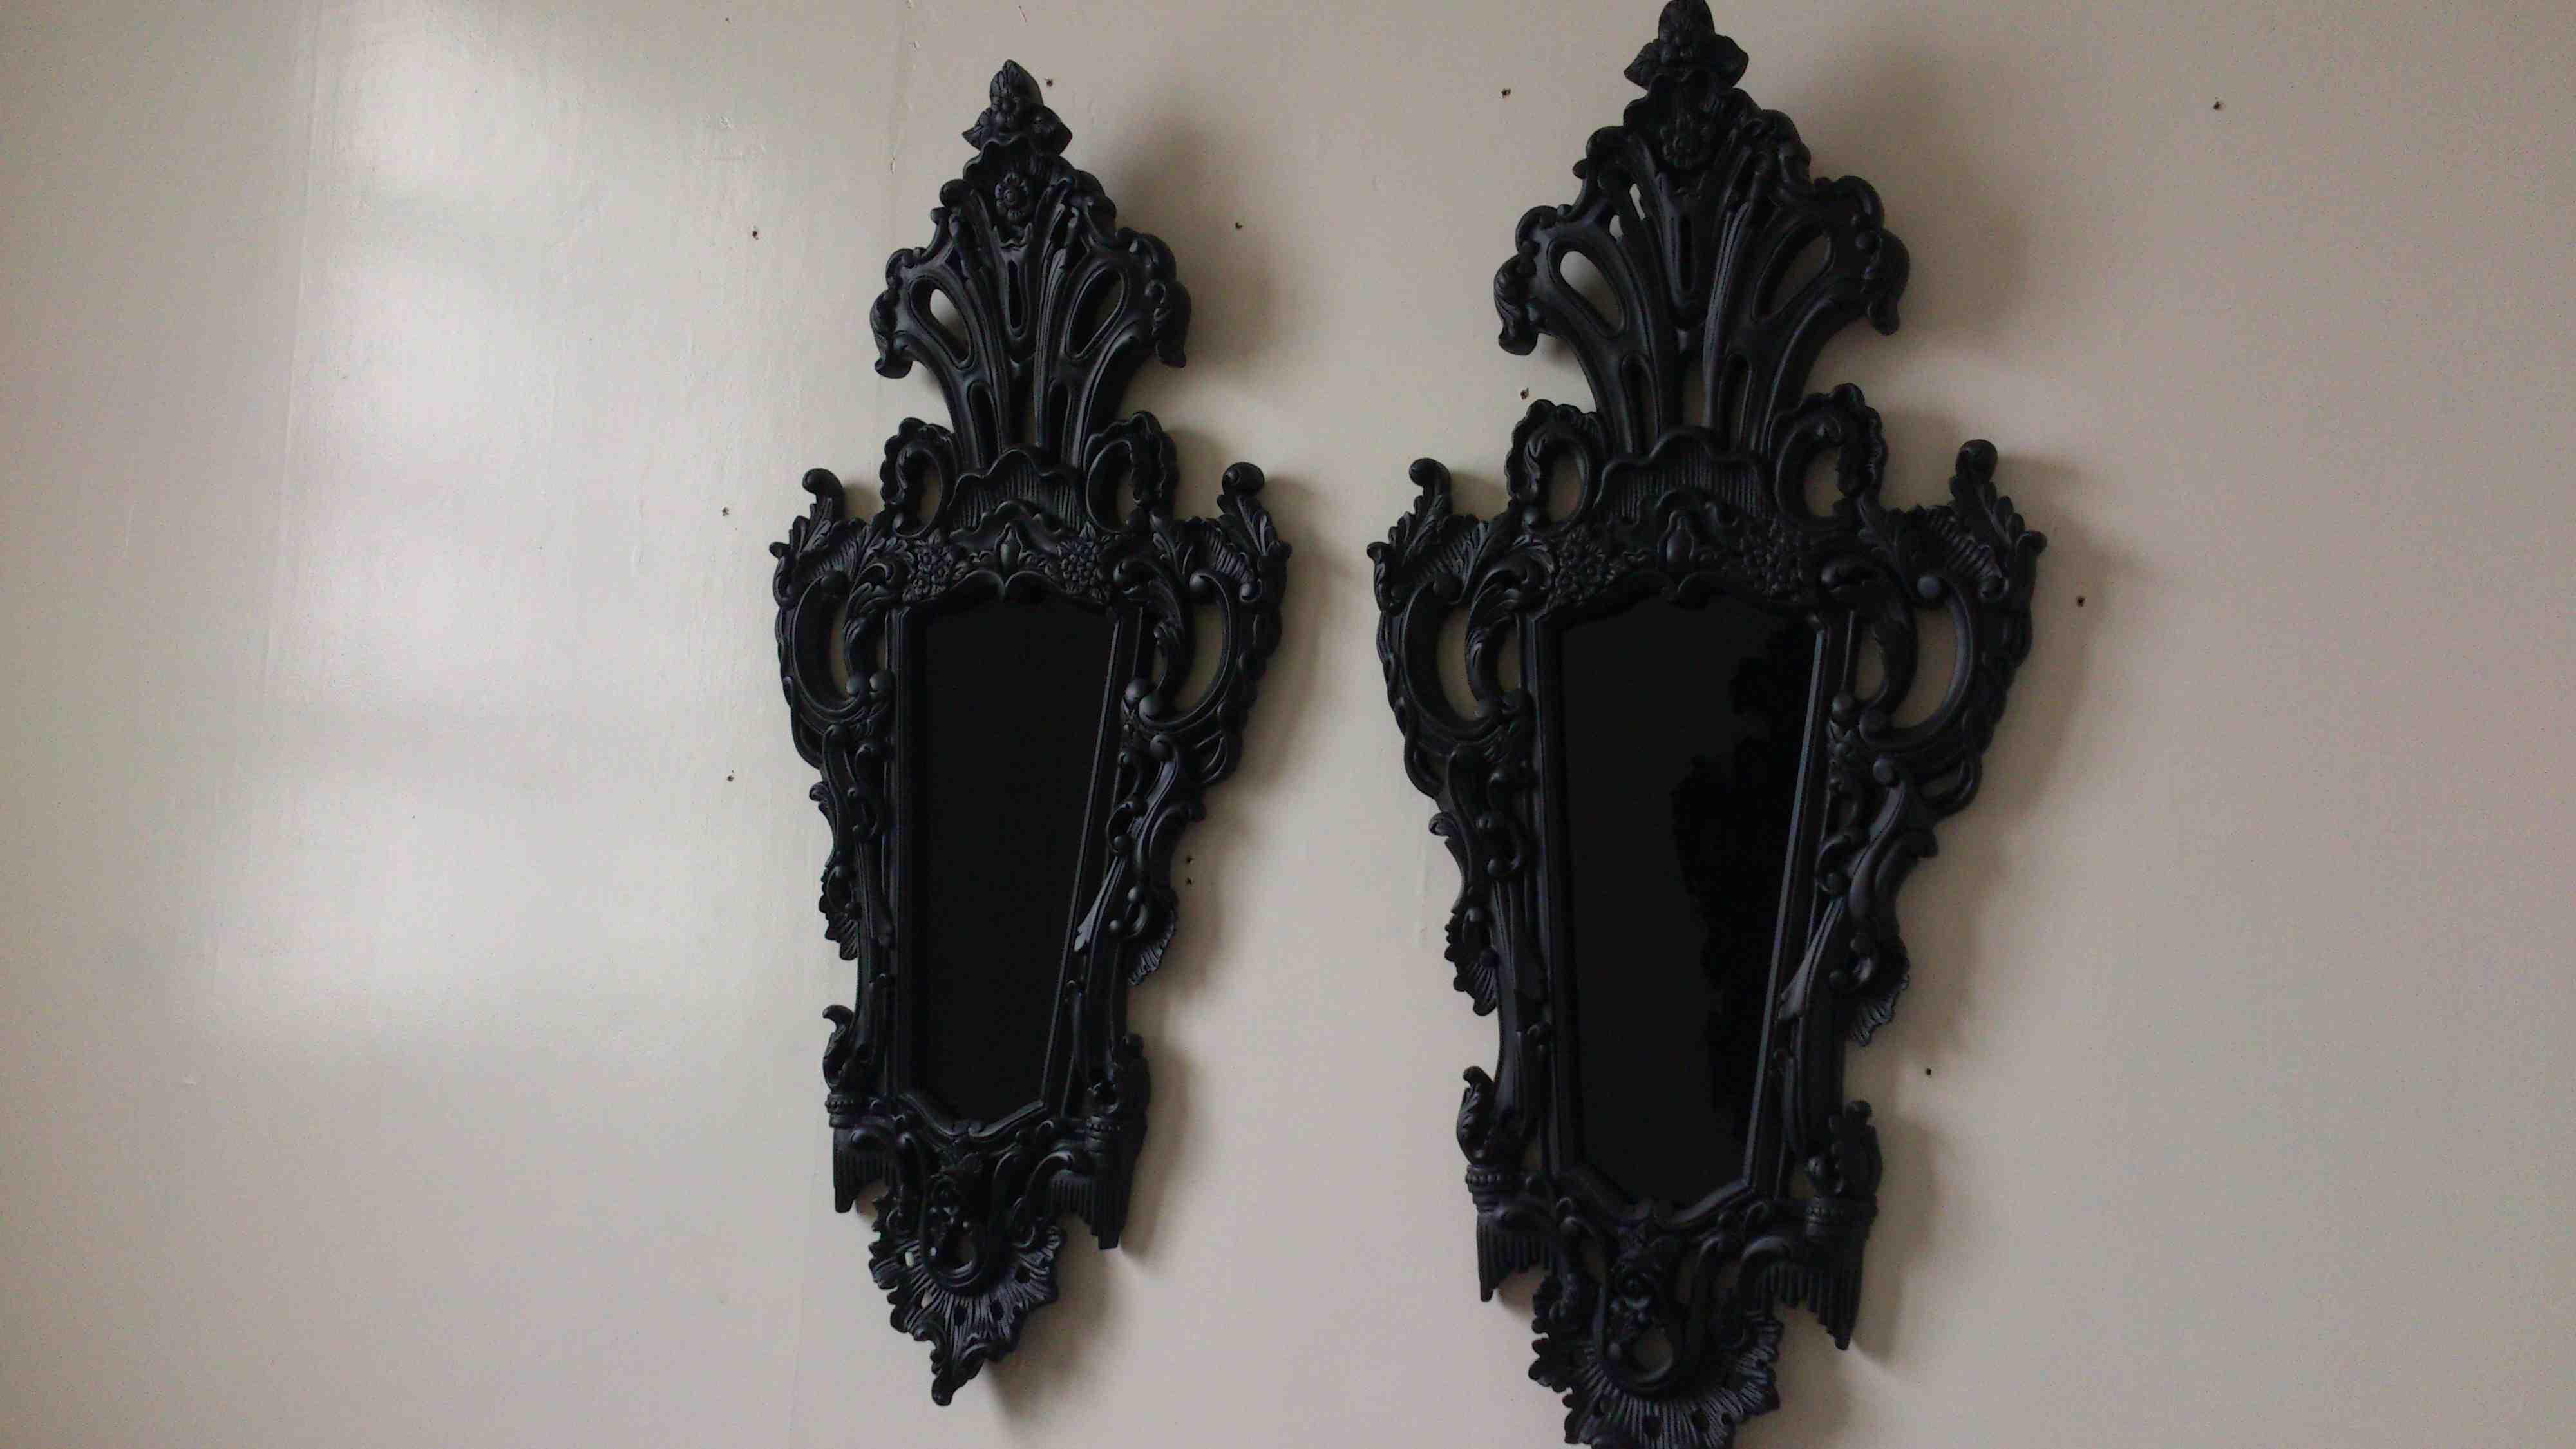 9. black mirror